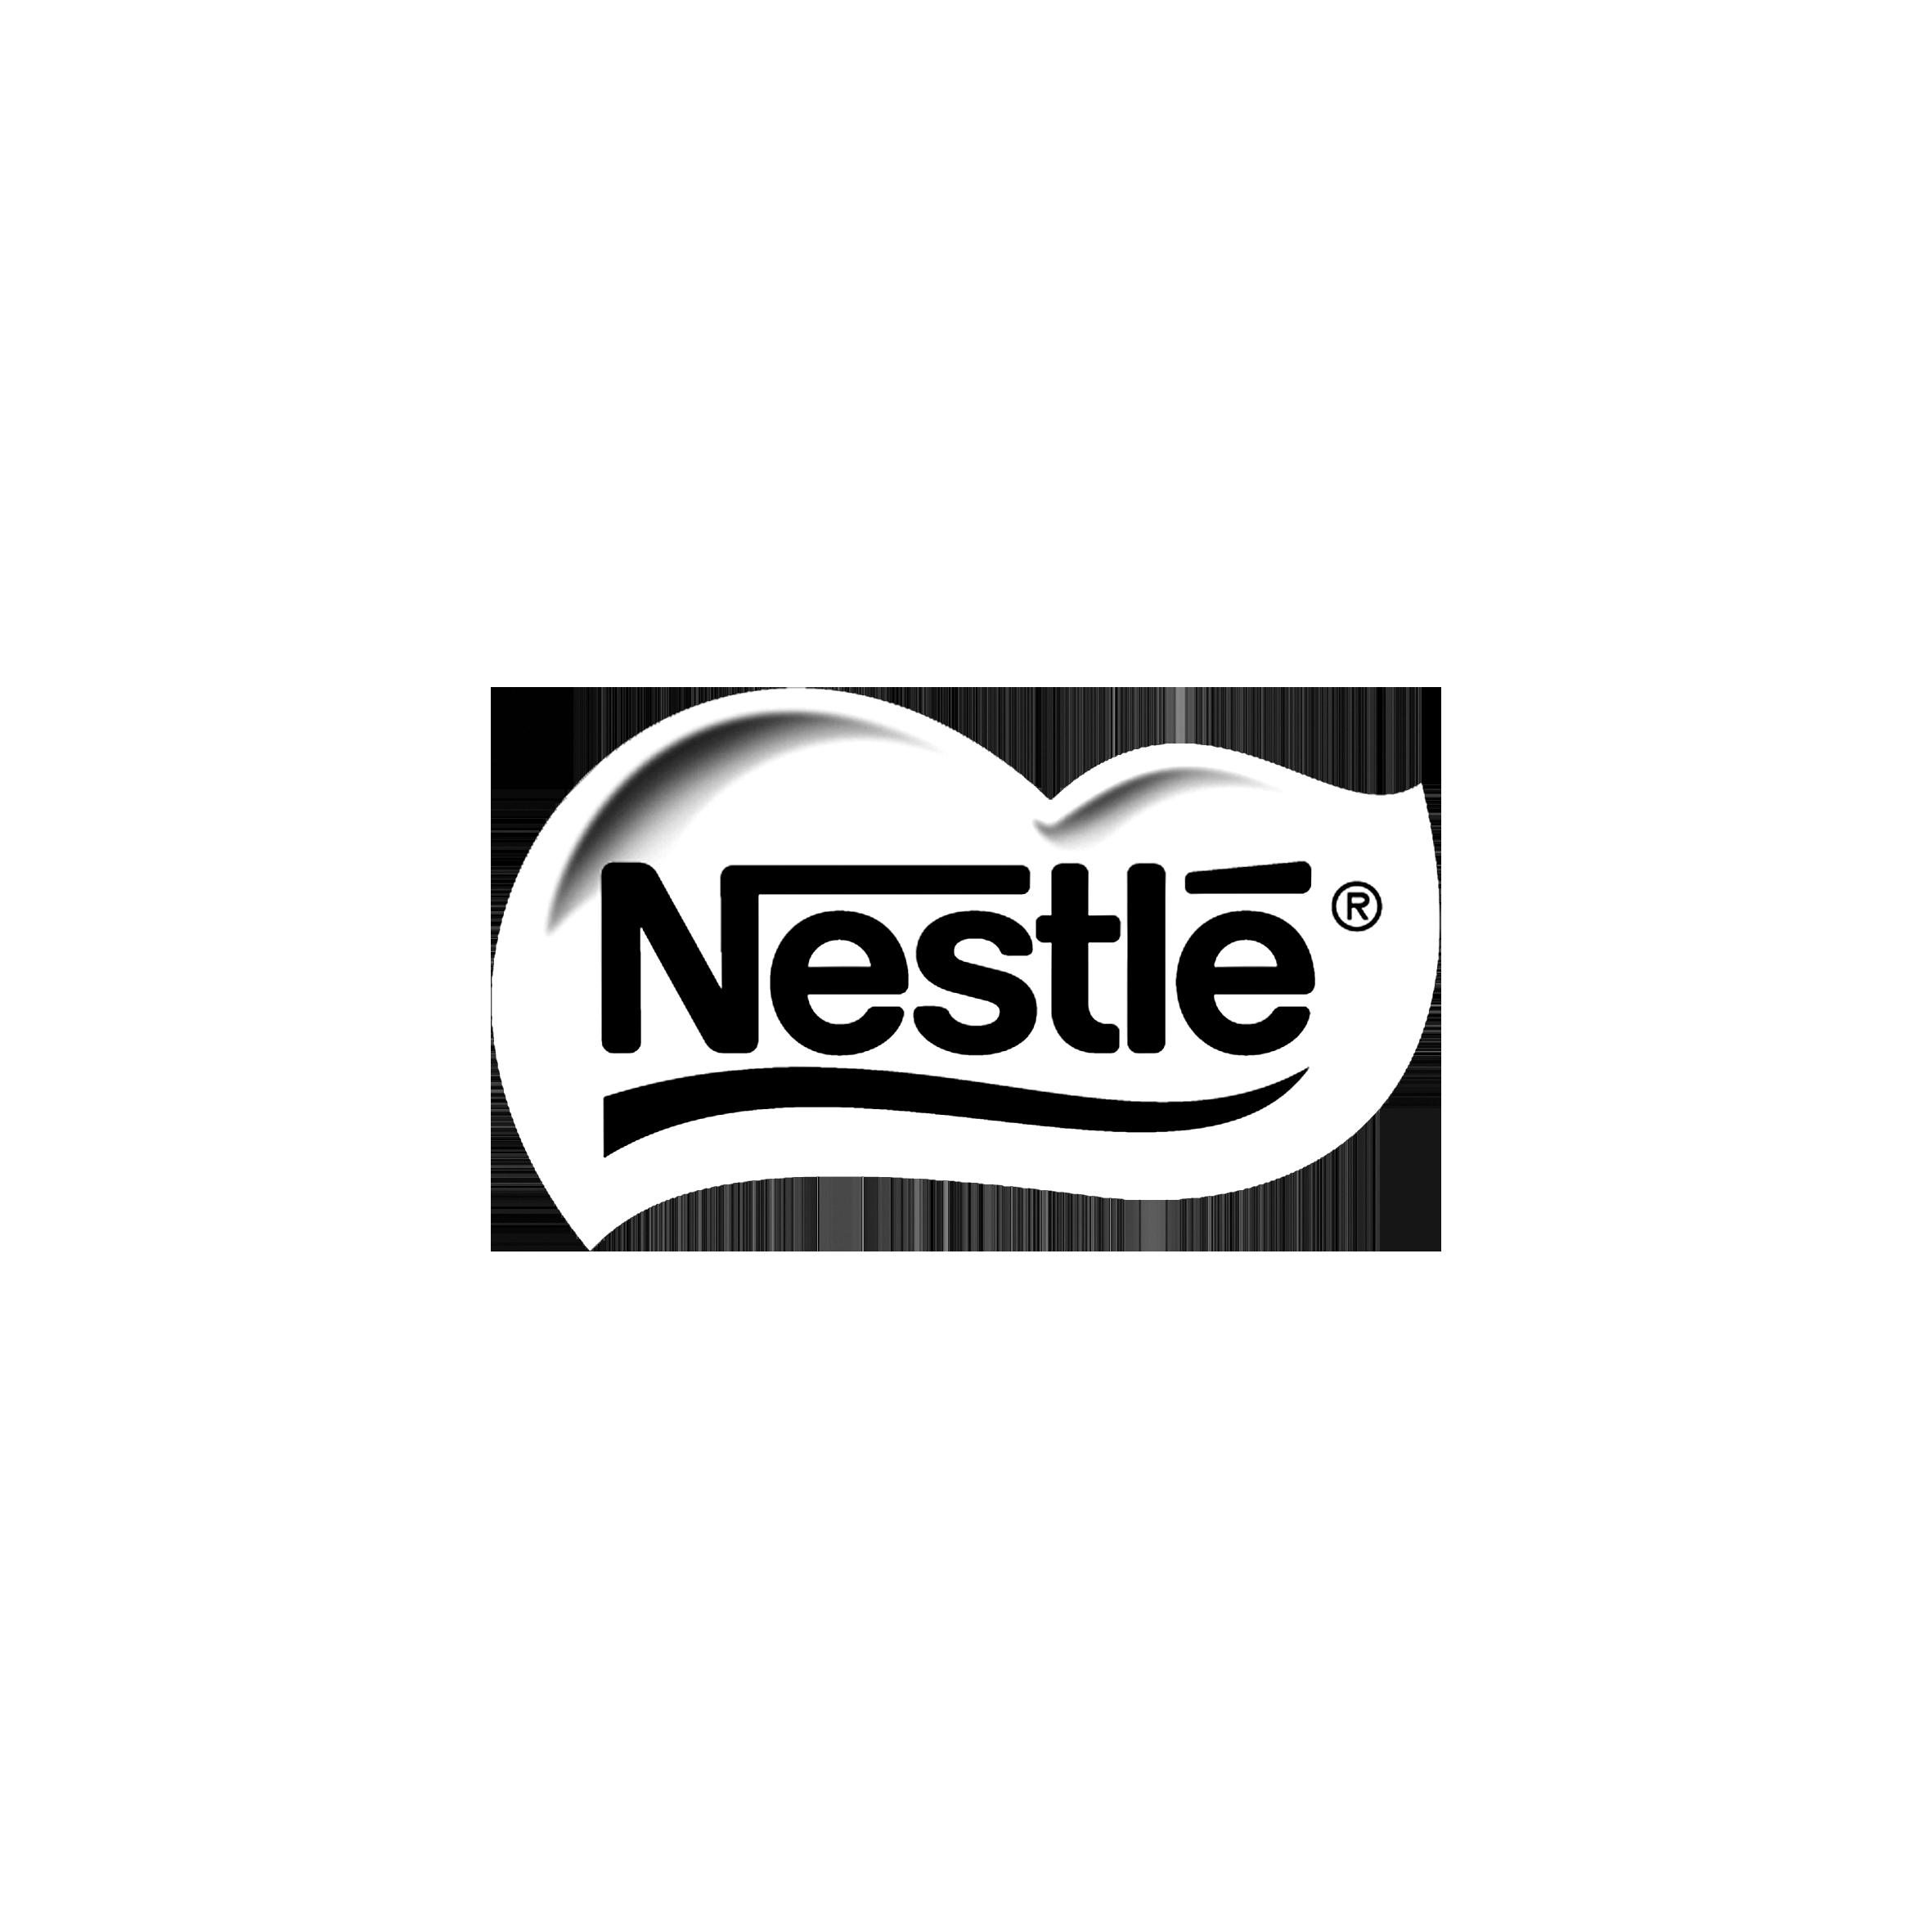 logo – nestle